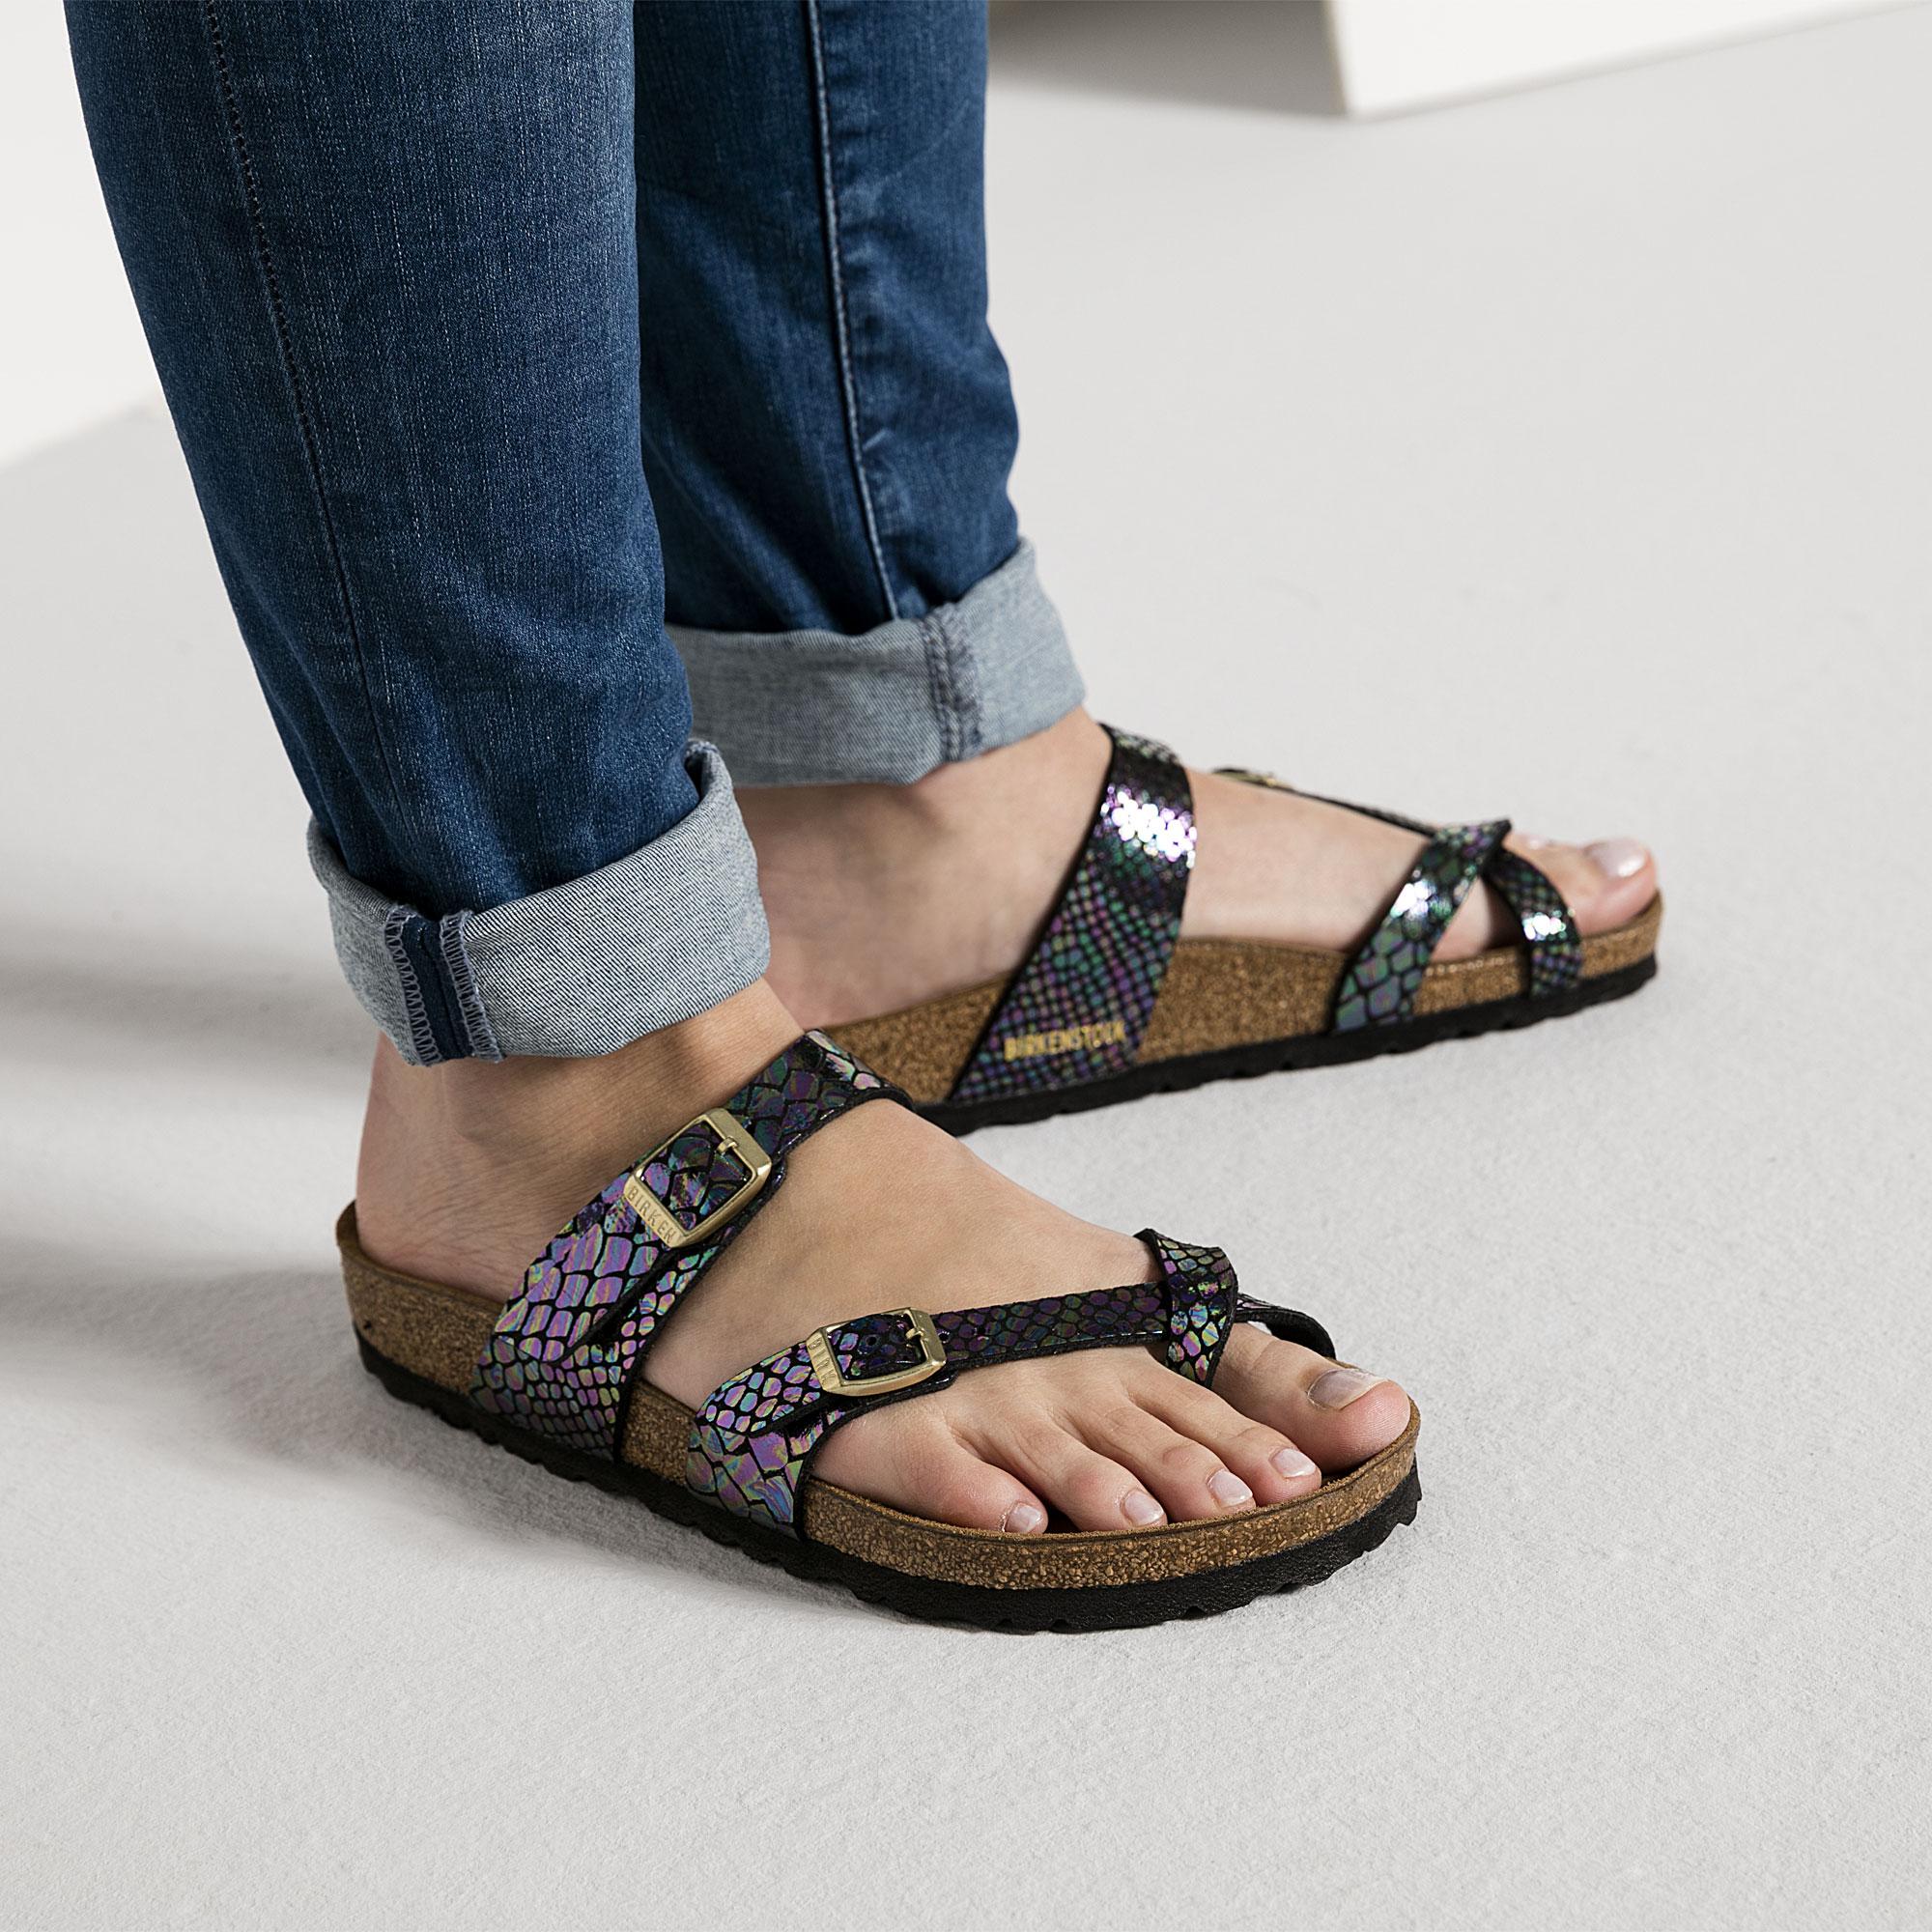 Birkenstock Mayari Birko Flor Sandals | Free Delivery Options